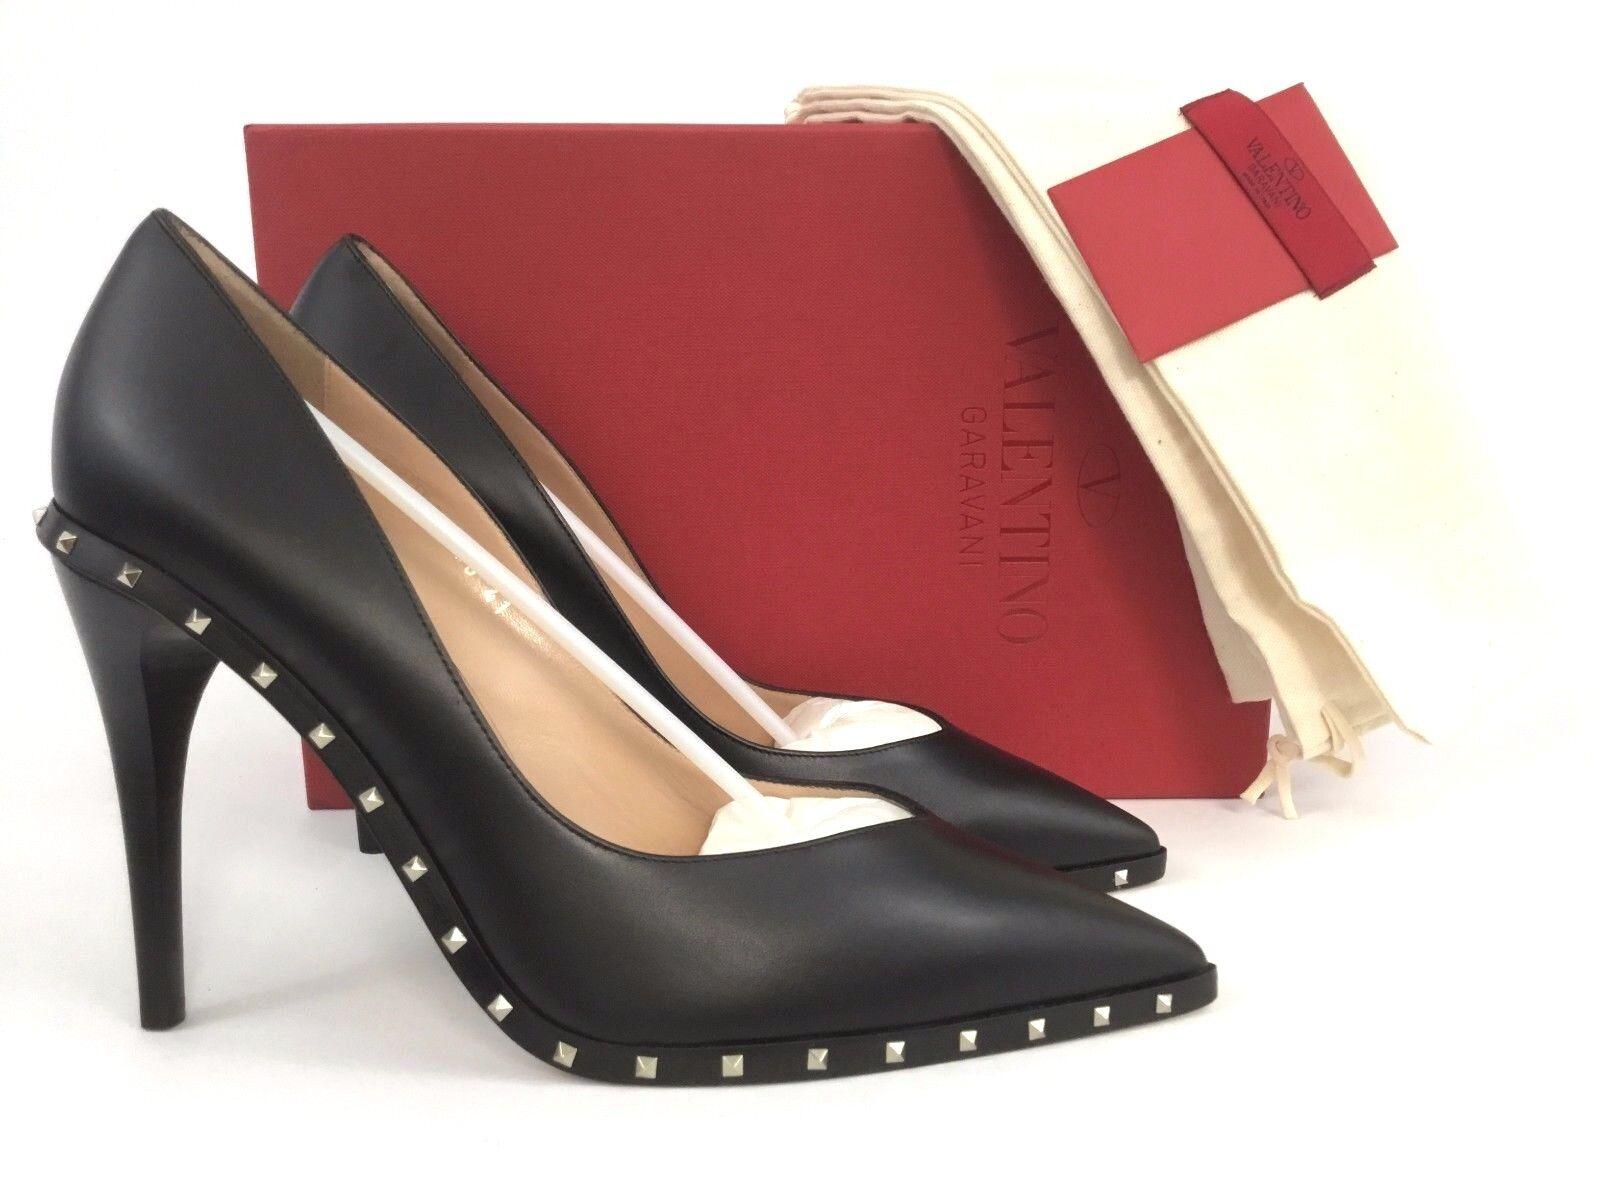 657019fd462 Valentino Garavani Soul Rockstud Leather BOOTIES Black 41 (11)